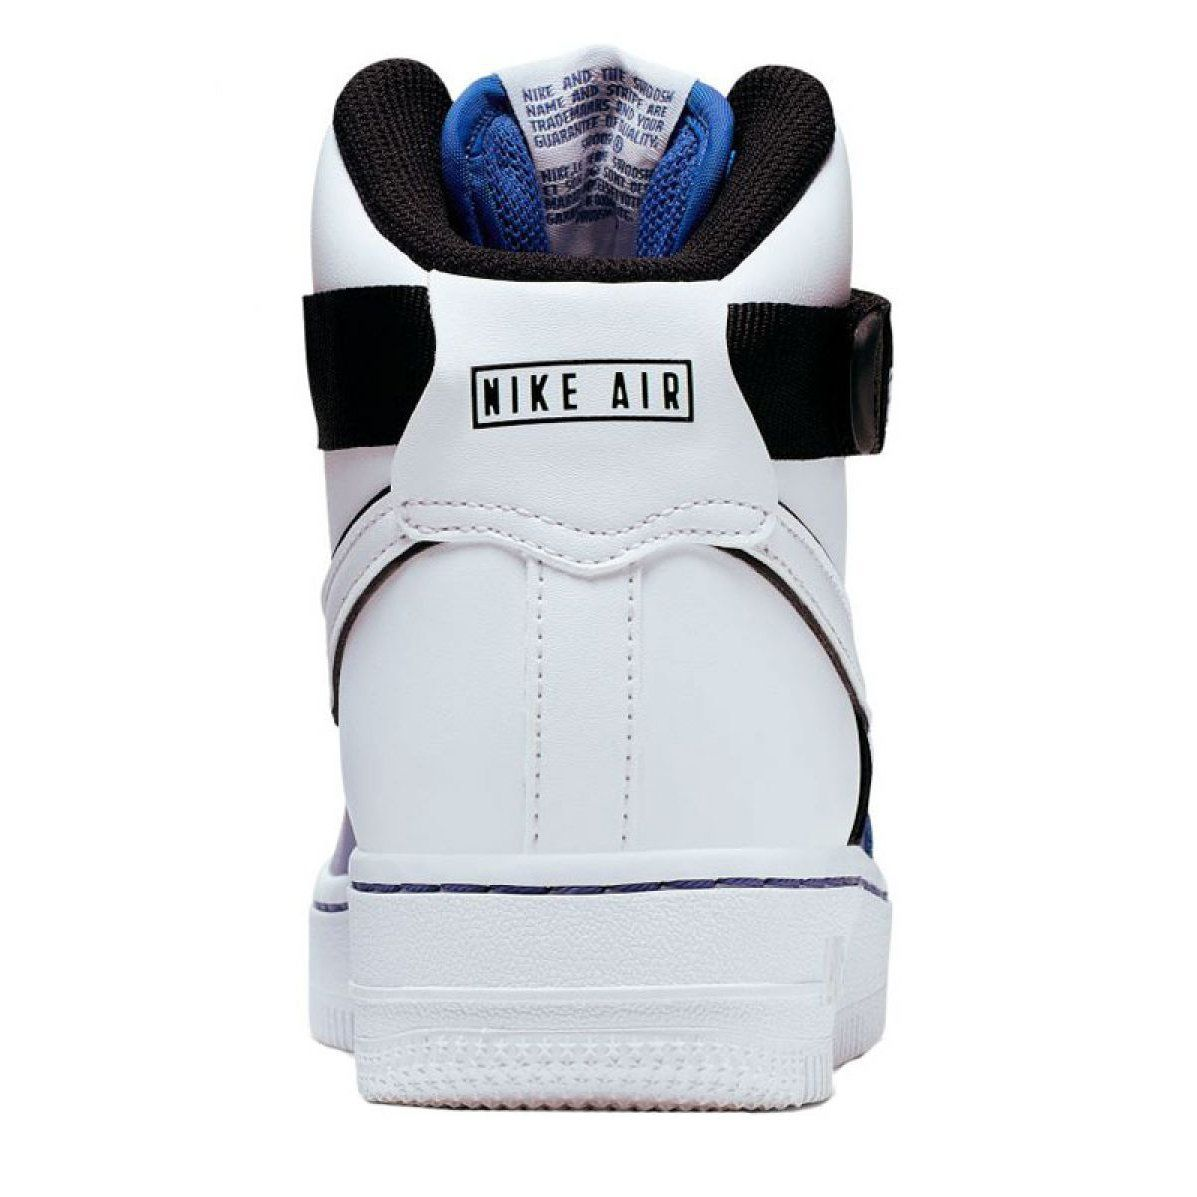 Buty Nike Air Force 1 High Lv8 2 Jr Ci2164 400 Bialo Niebieskie Biale Nike Air Nike Air Force Air Force 1 High